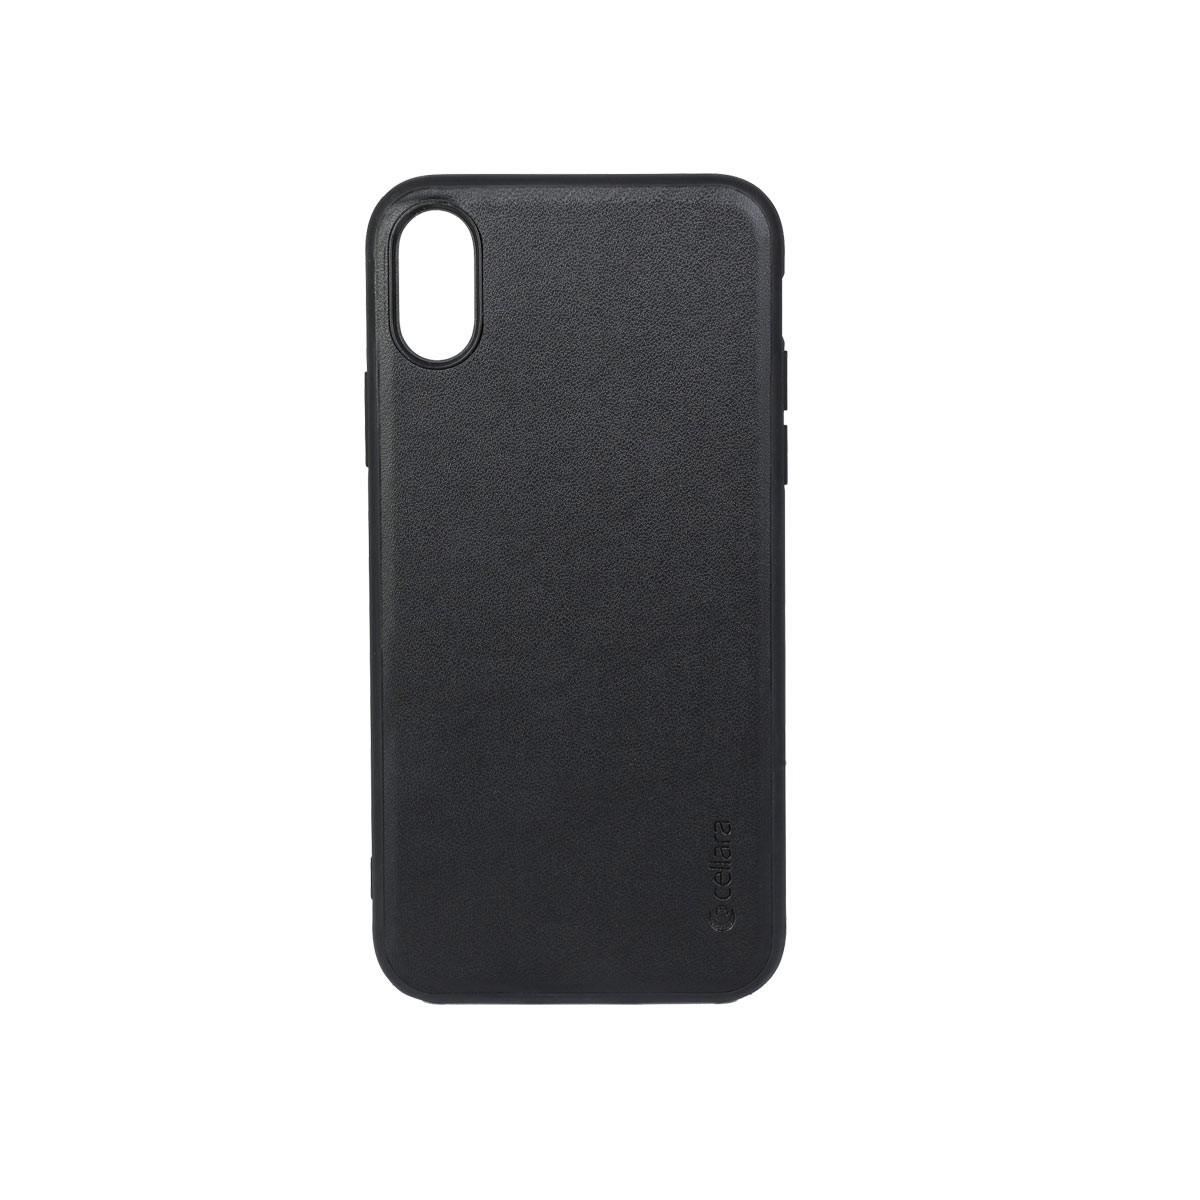 Capac protectie spate cellara colectia signature pentru iphone x/xs - negru